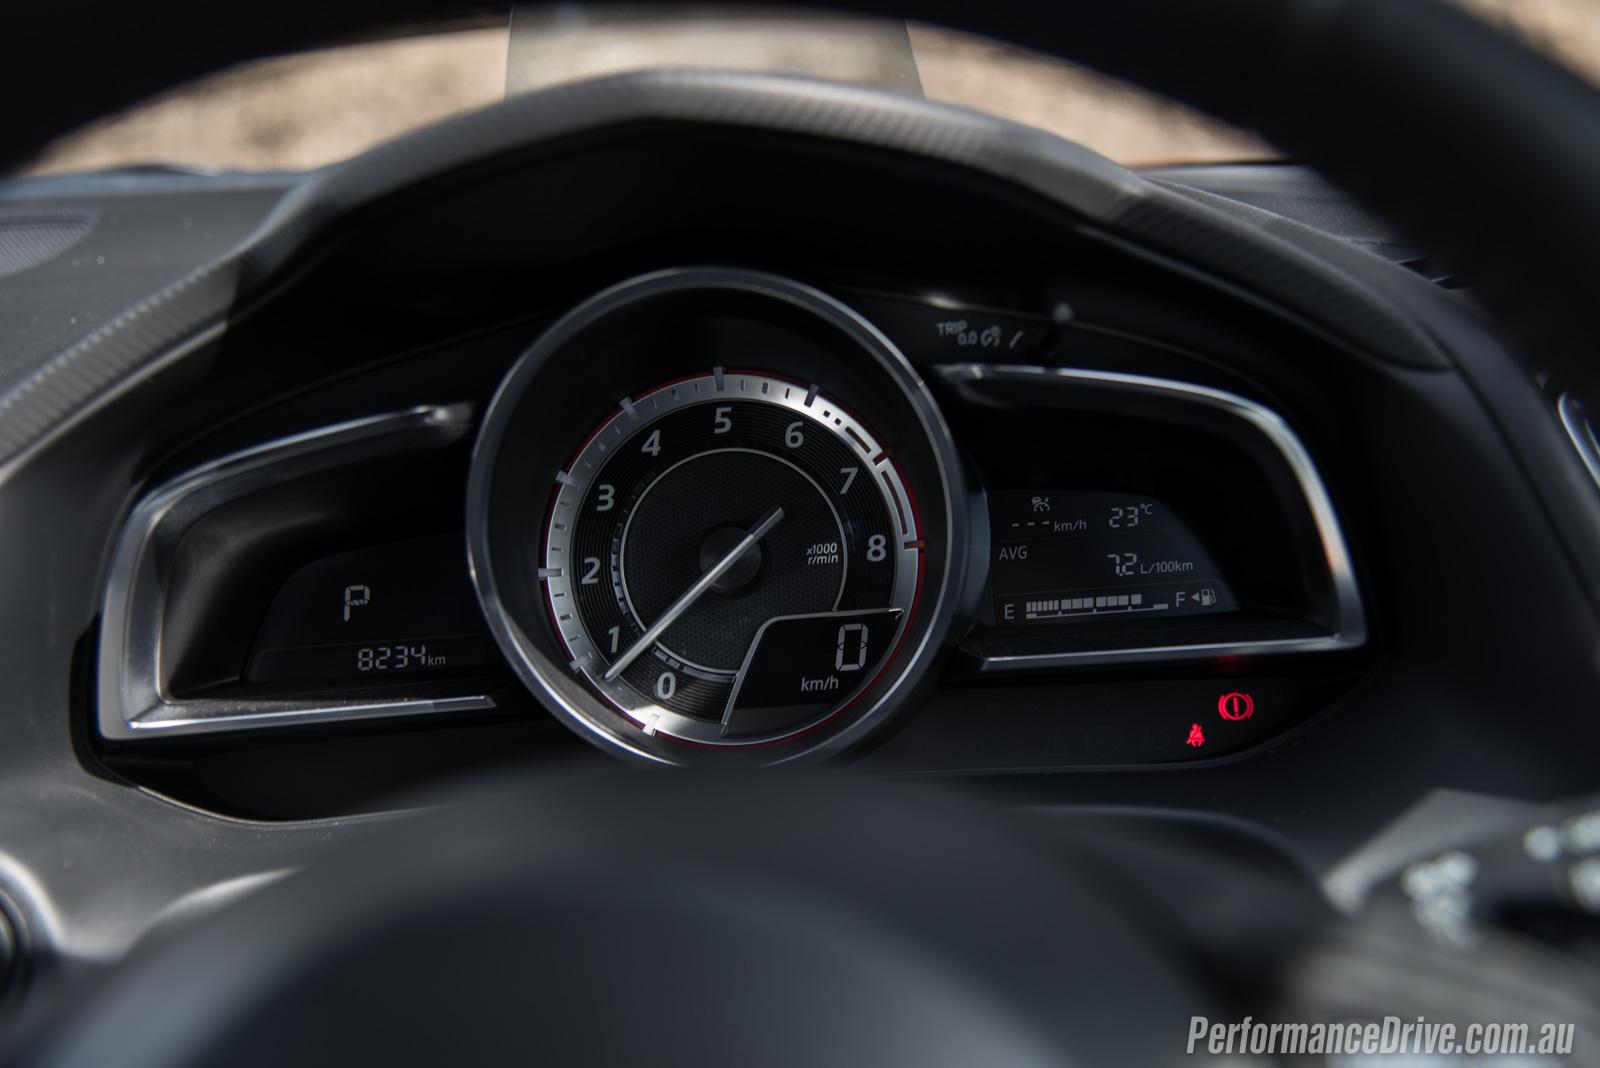 2016 Mazda3 Sp25 Astina Review Video Performancedrive